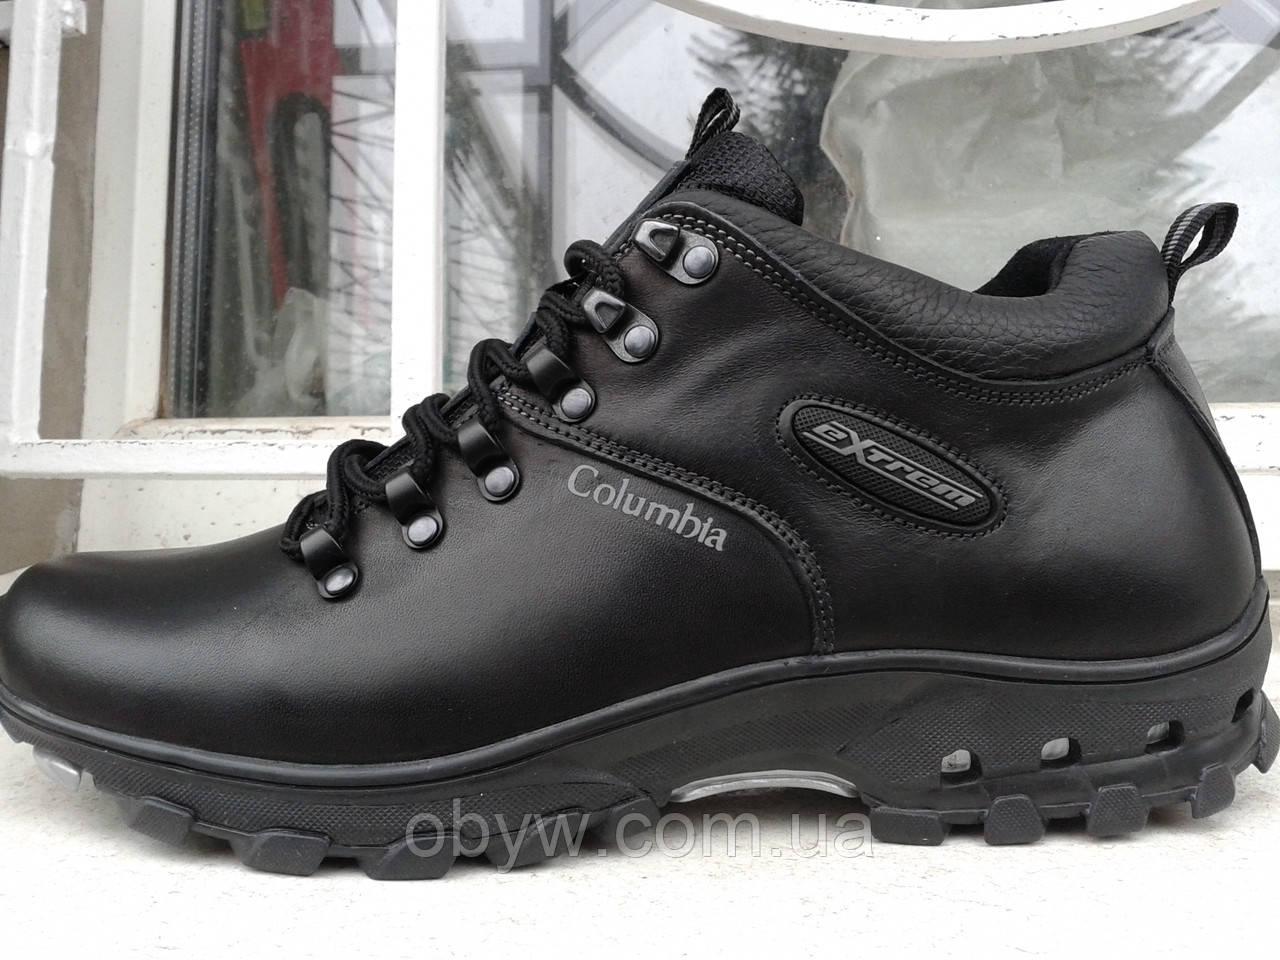 Зимние мужские кроссовки Cаlambia